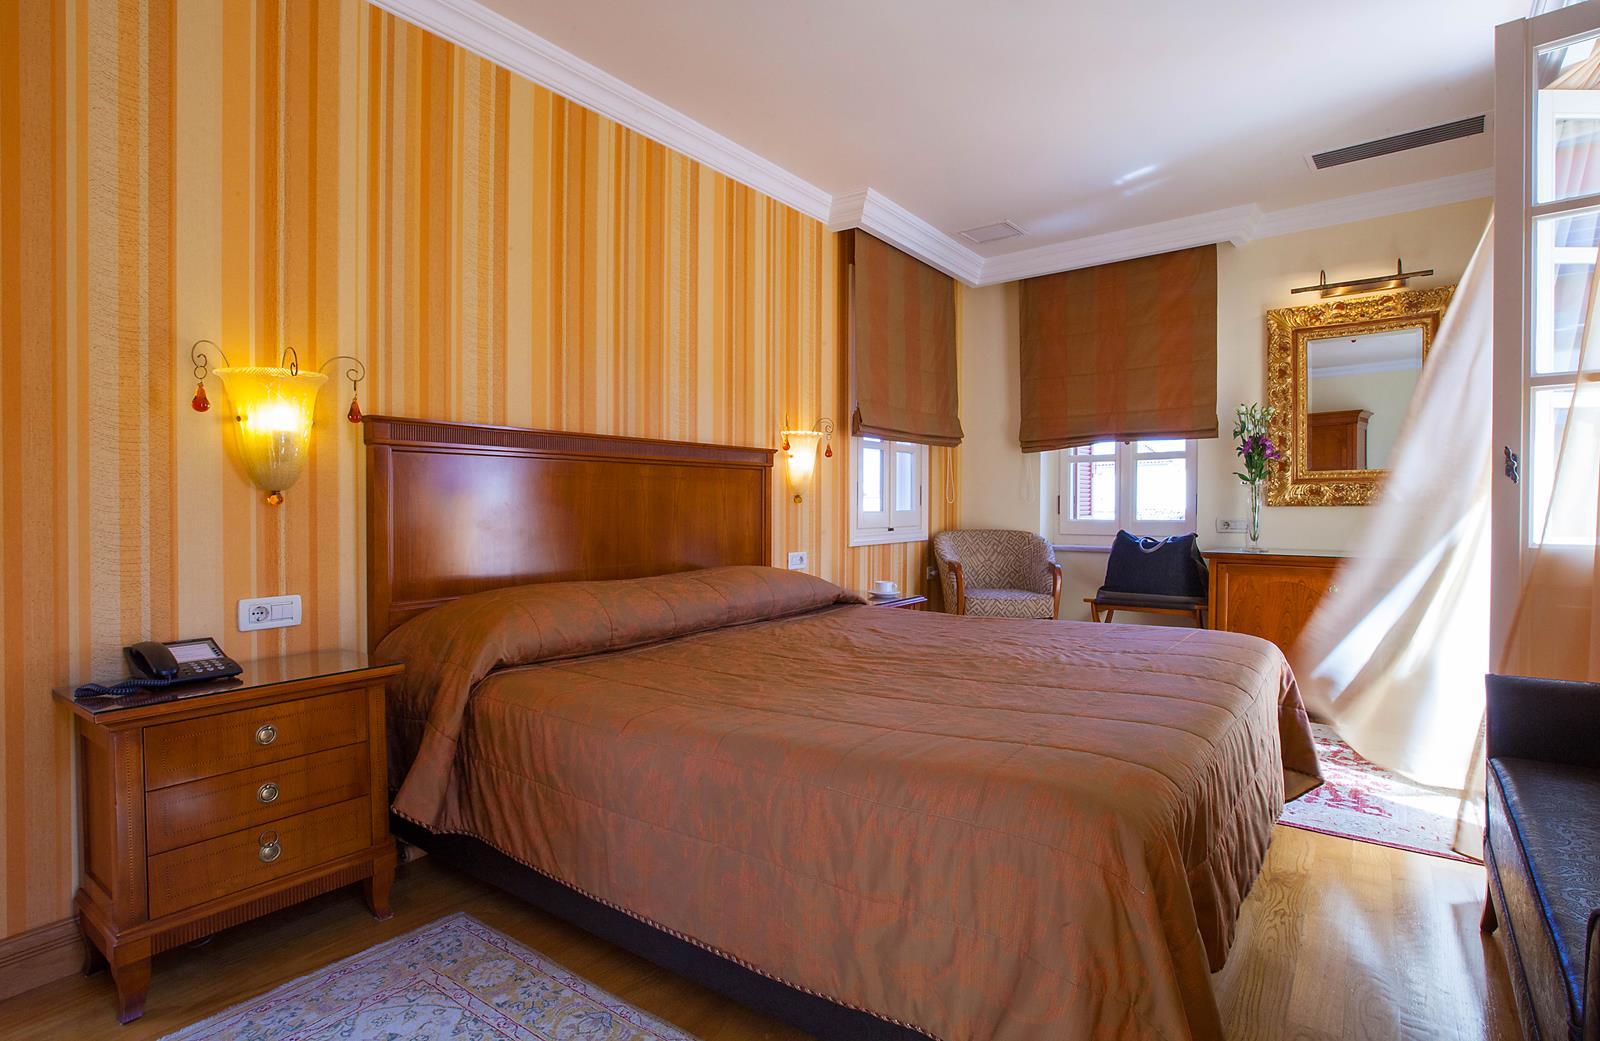 nafplio stay - Aetoma hotel